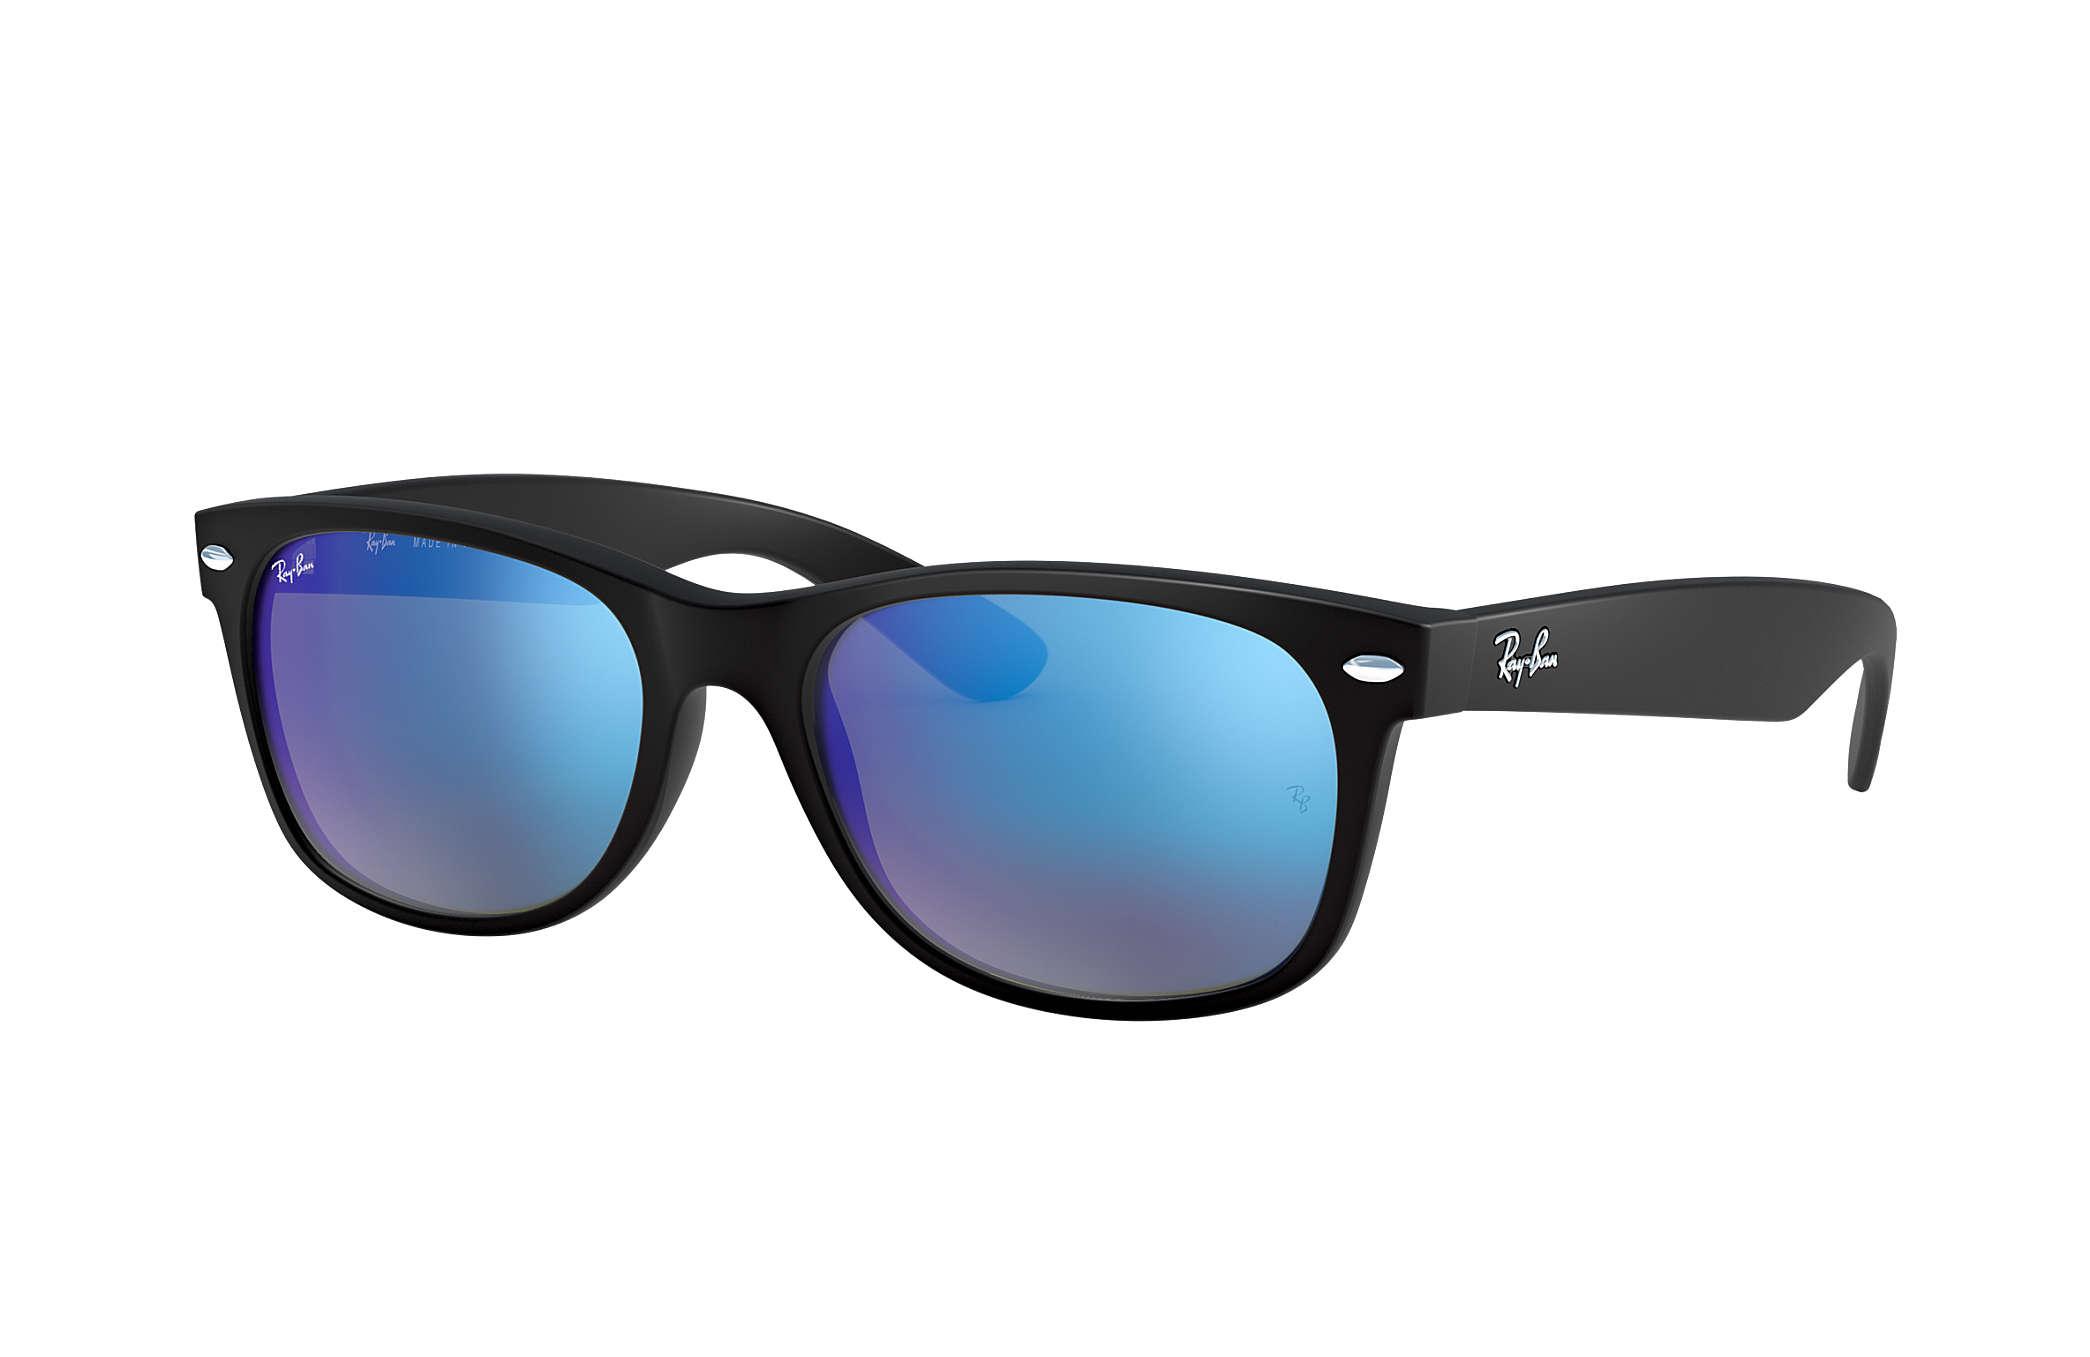 a32f79600 Ray-Ban New Wayfarer Flash RB2132 Black - Nylon - Blue Lenses ...